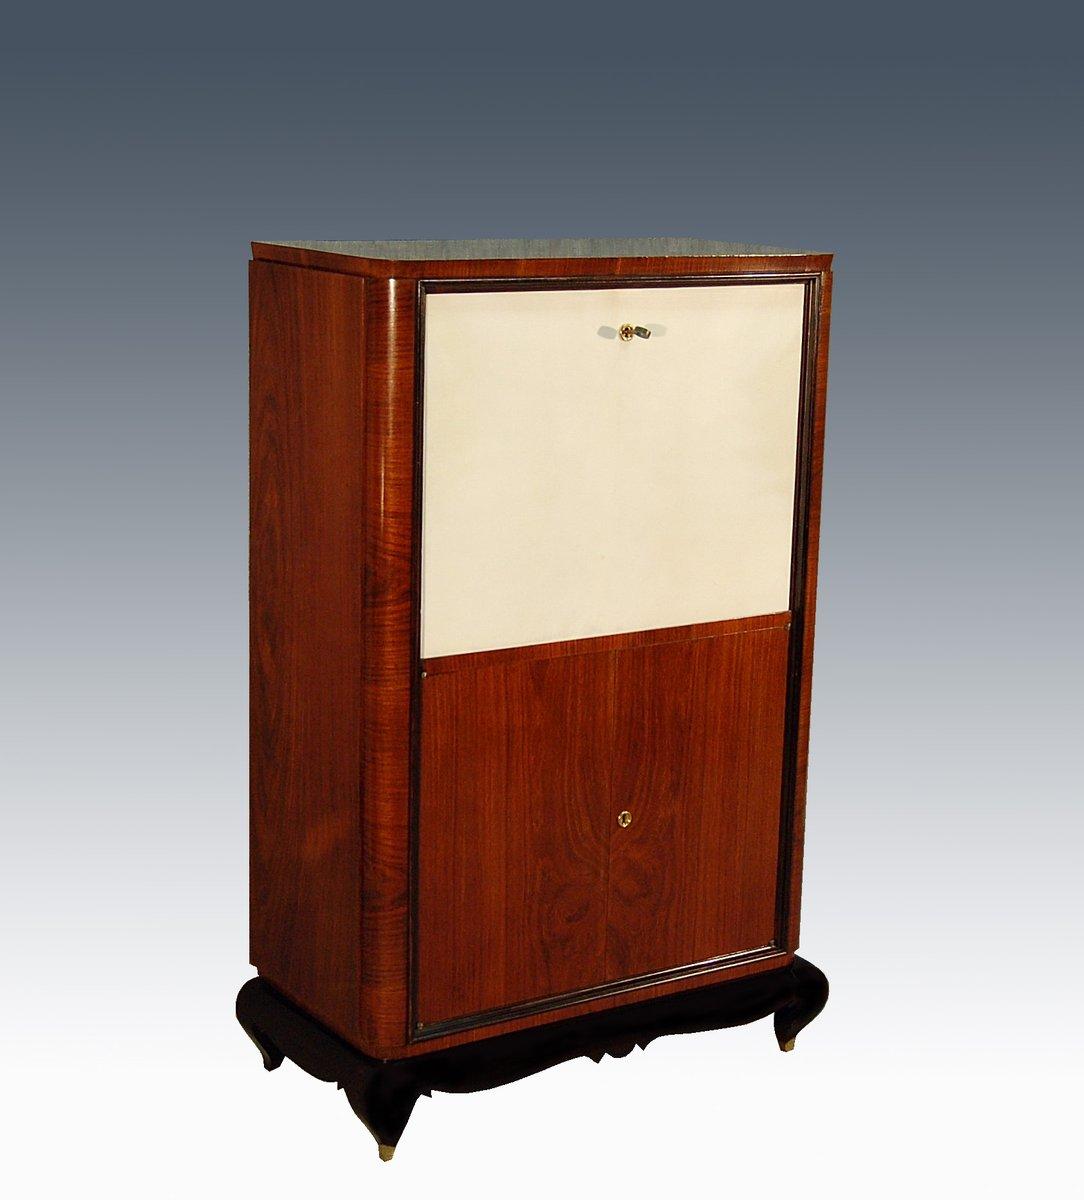 art deco secretaire 1940s for sale at pamono. Black Bedroom Furniture Sets. Home Design Ideas